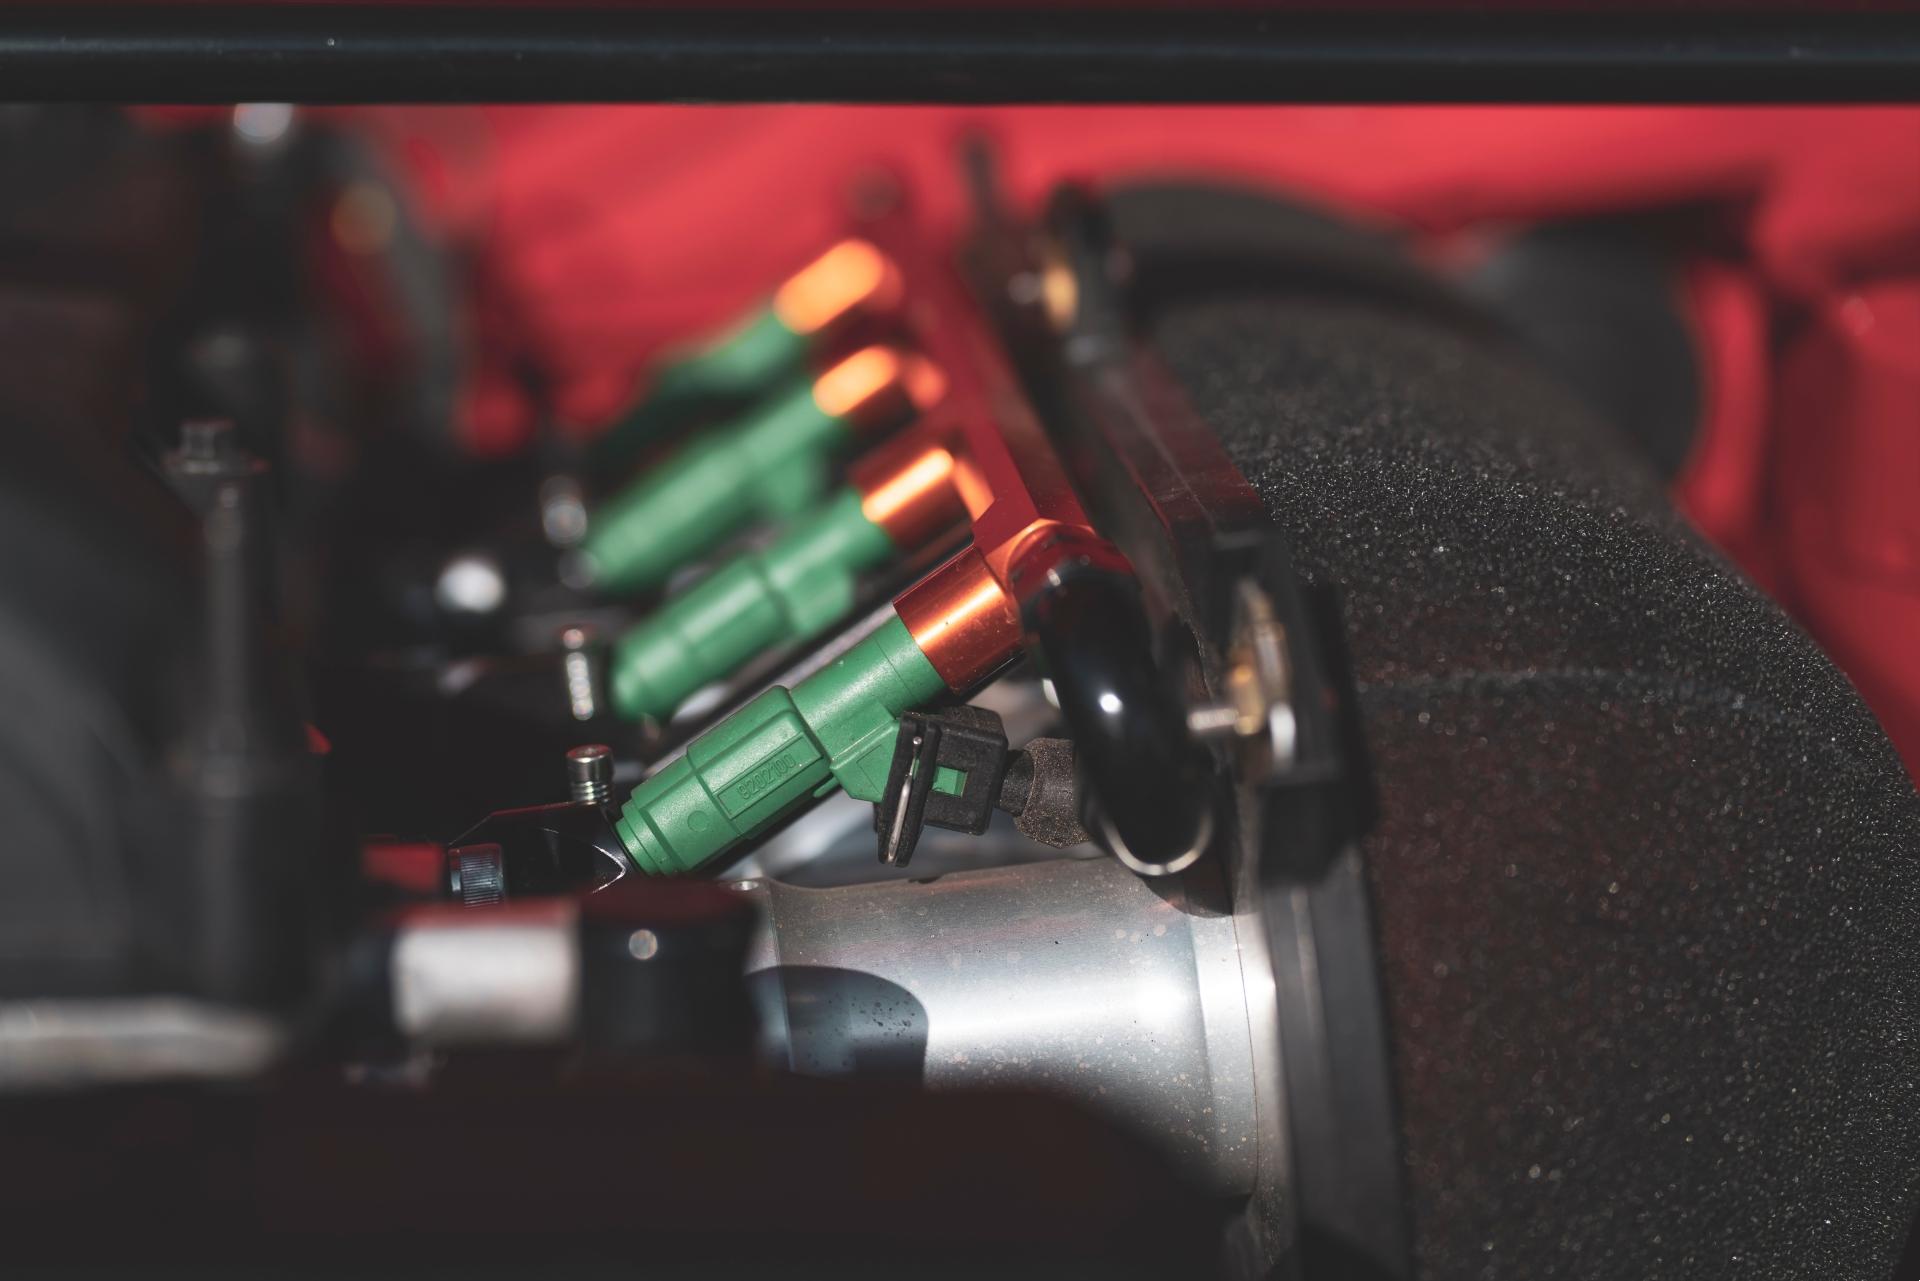 MST Mk2 injector detail